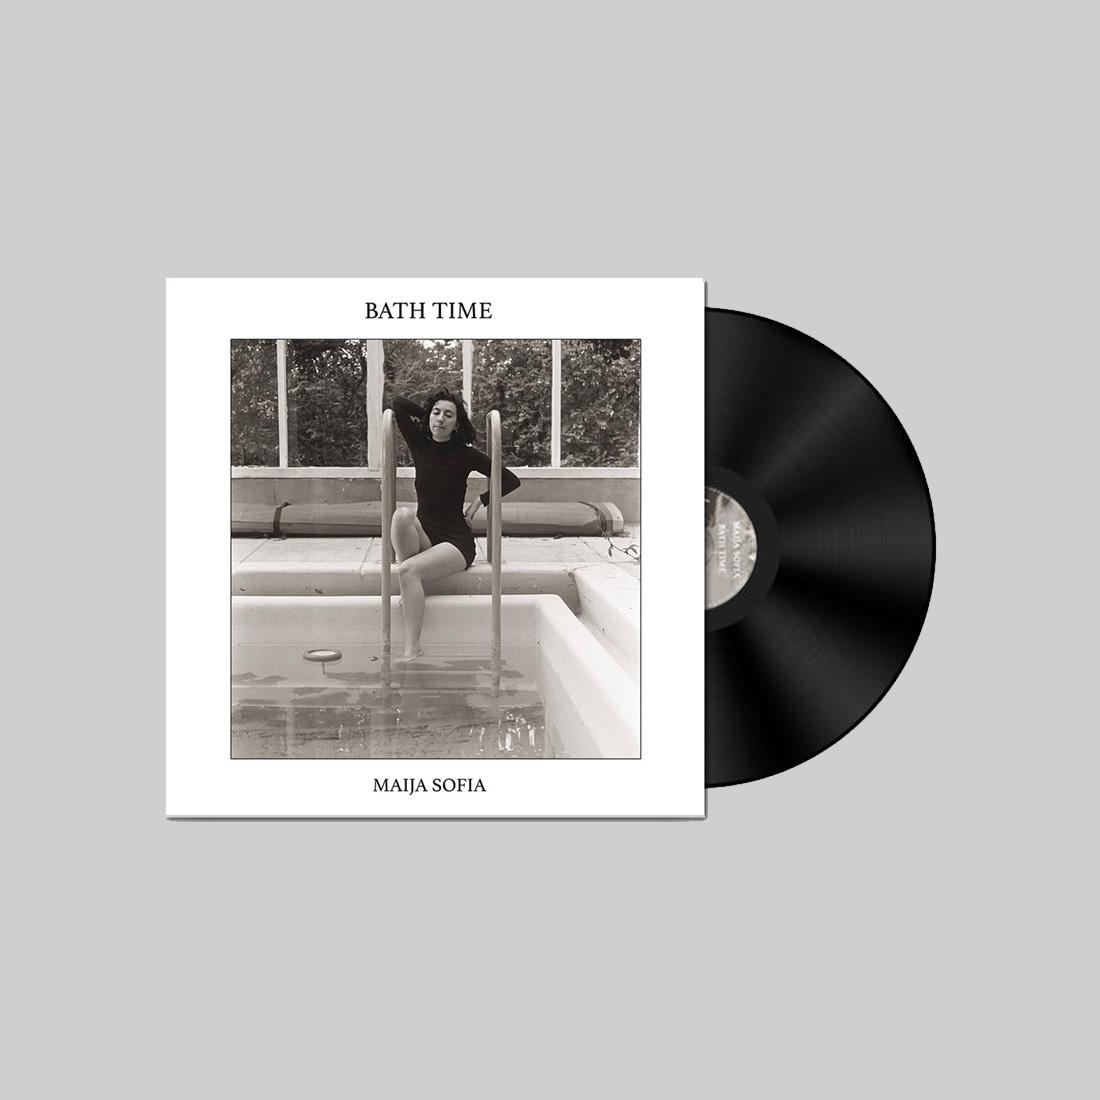 Maija Sofia - Bath Time LP/ CD / DL